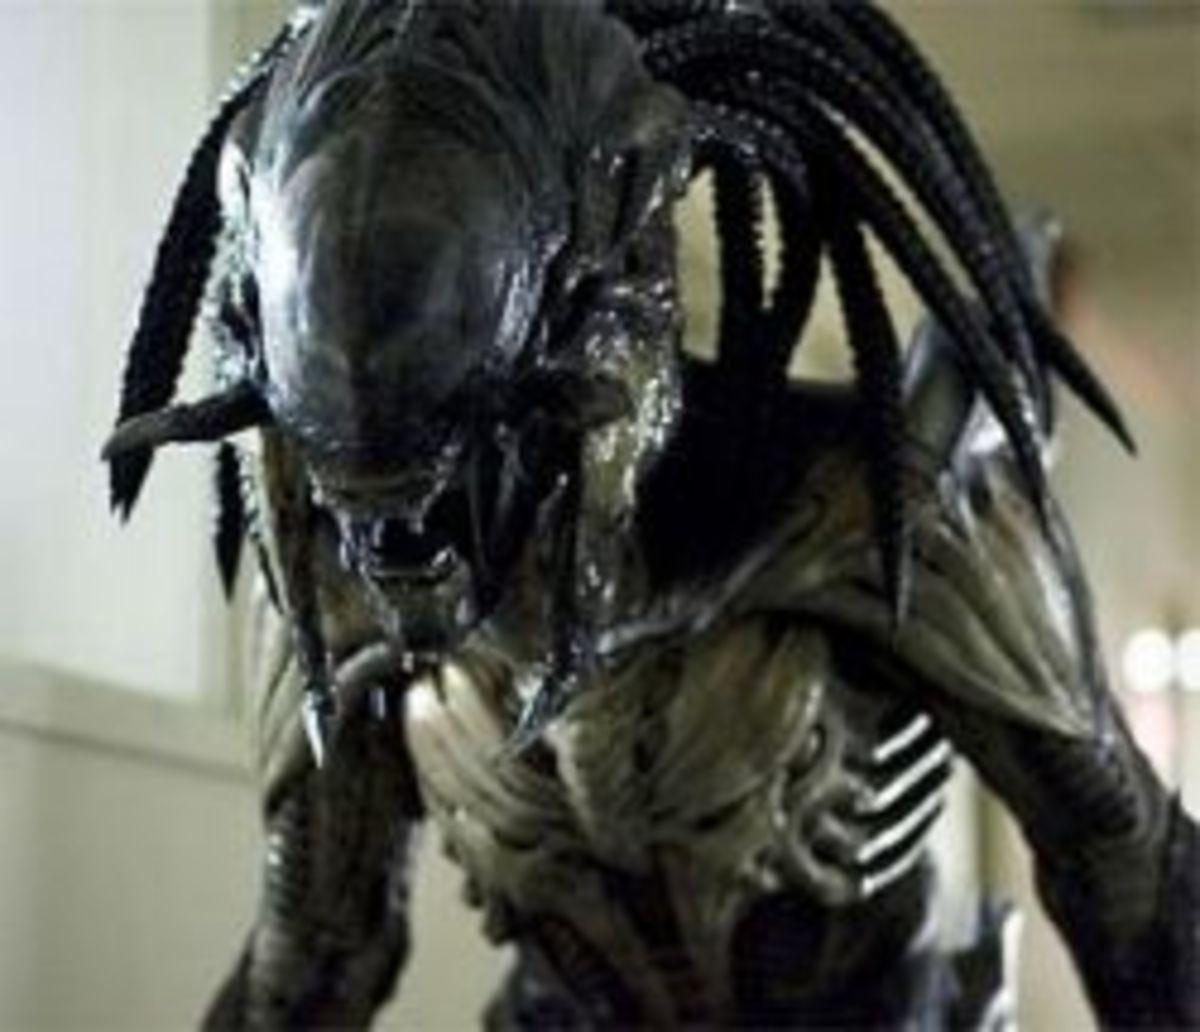 Predalien (Alien and Predator hybrid)